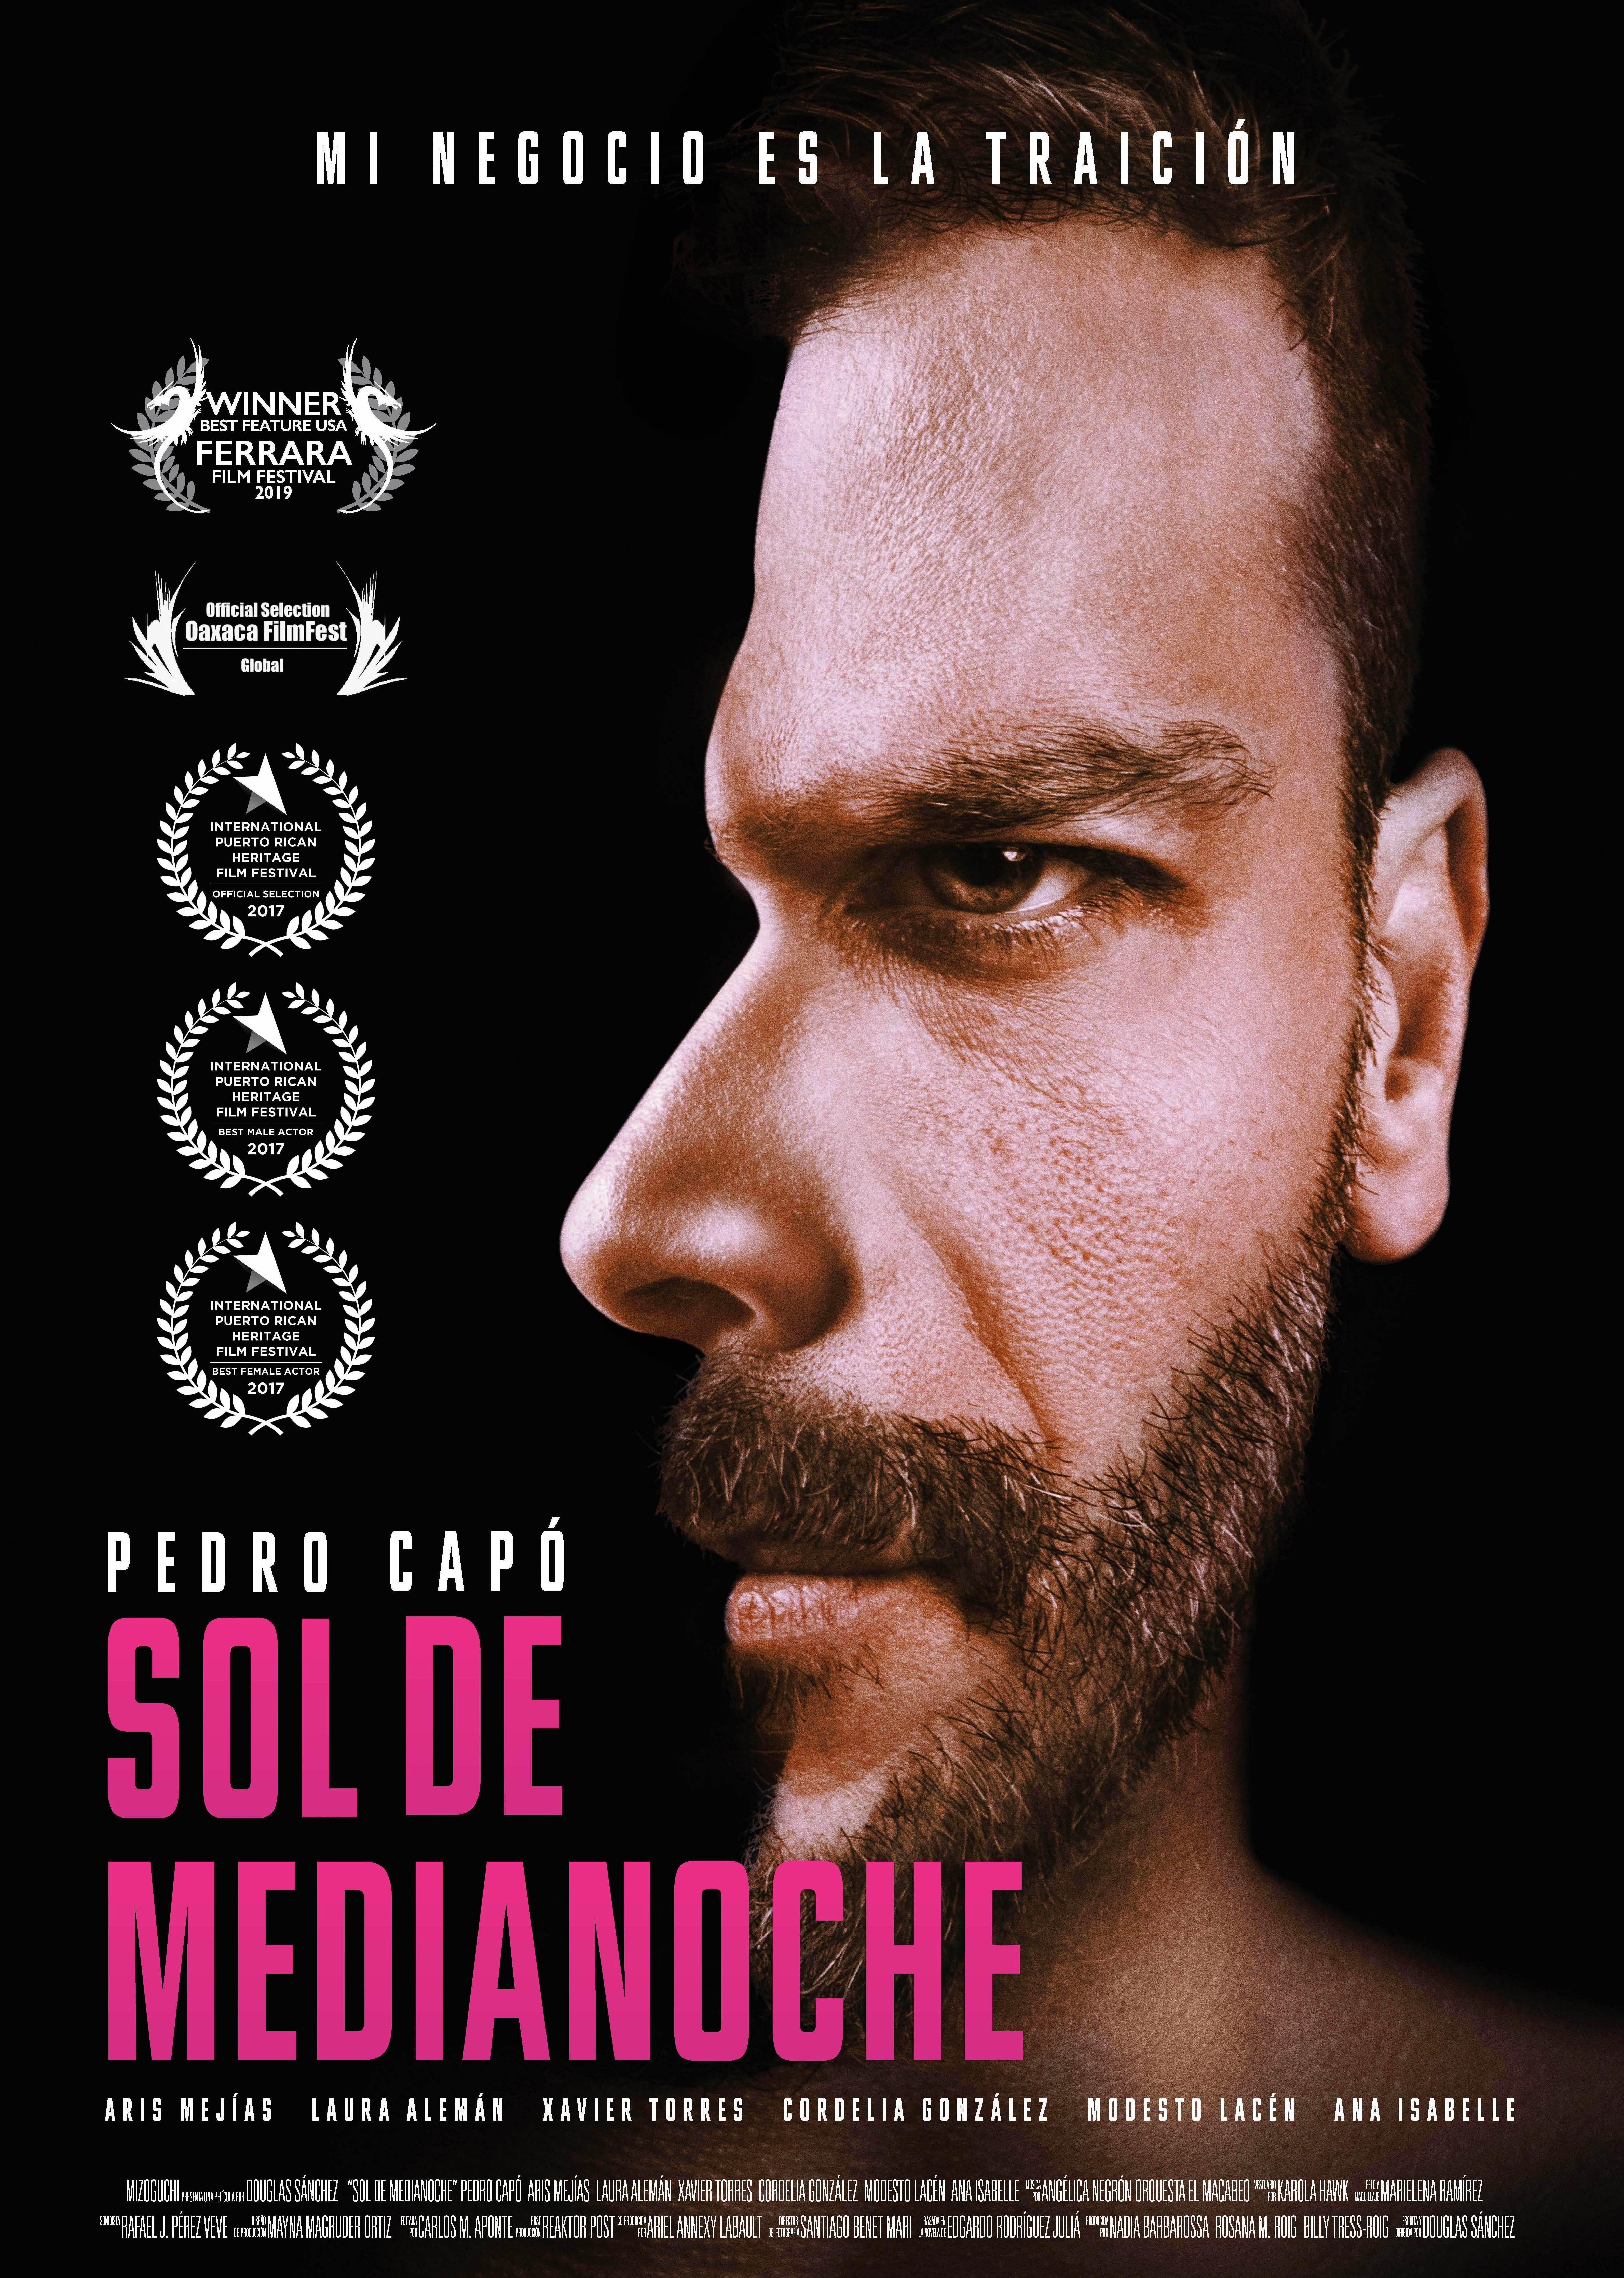 Sol de Medianoche (2018) IMDb